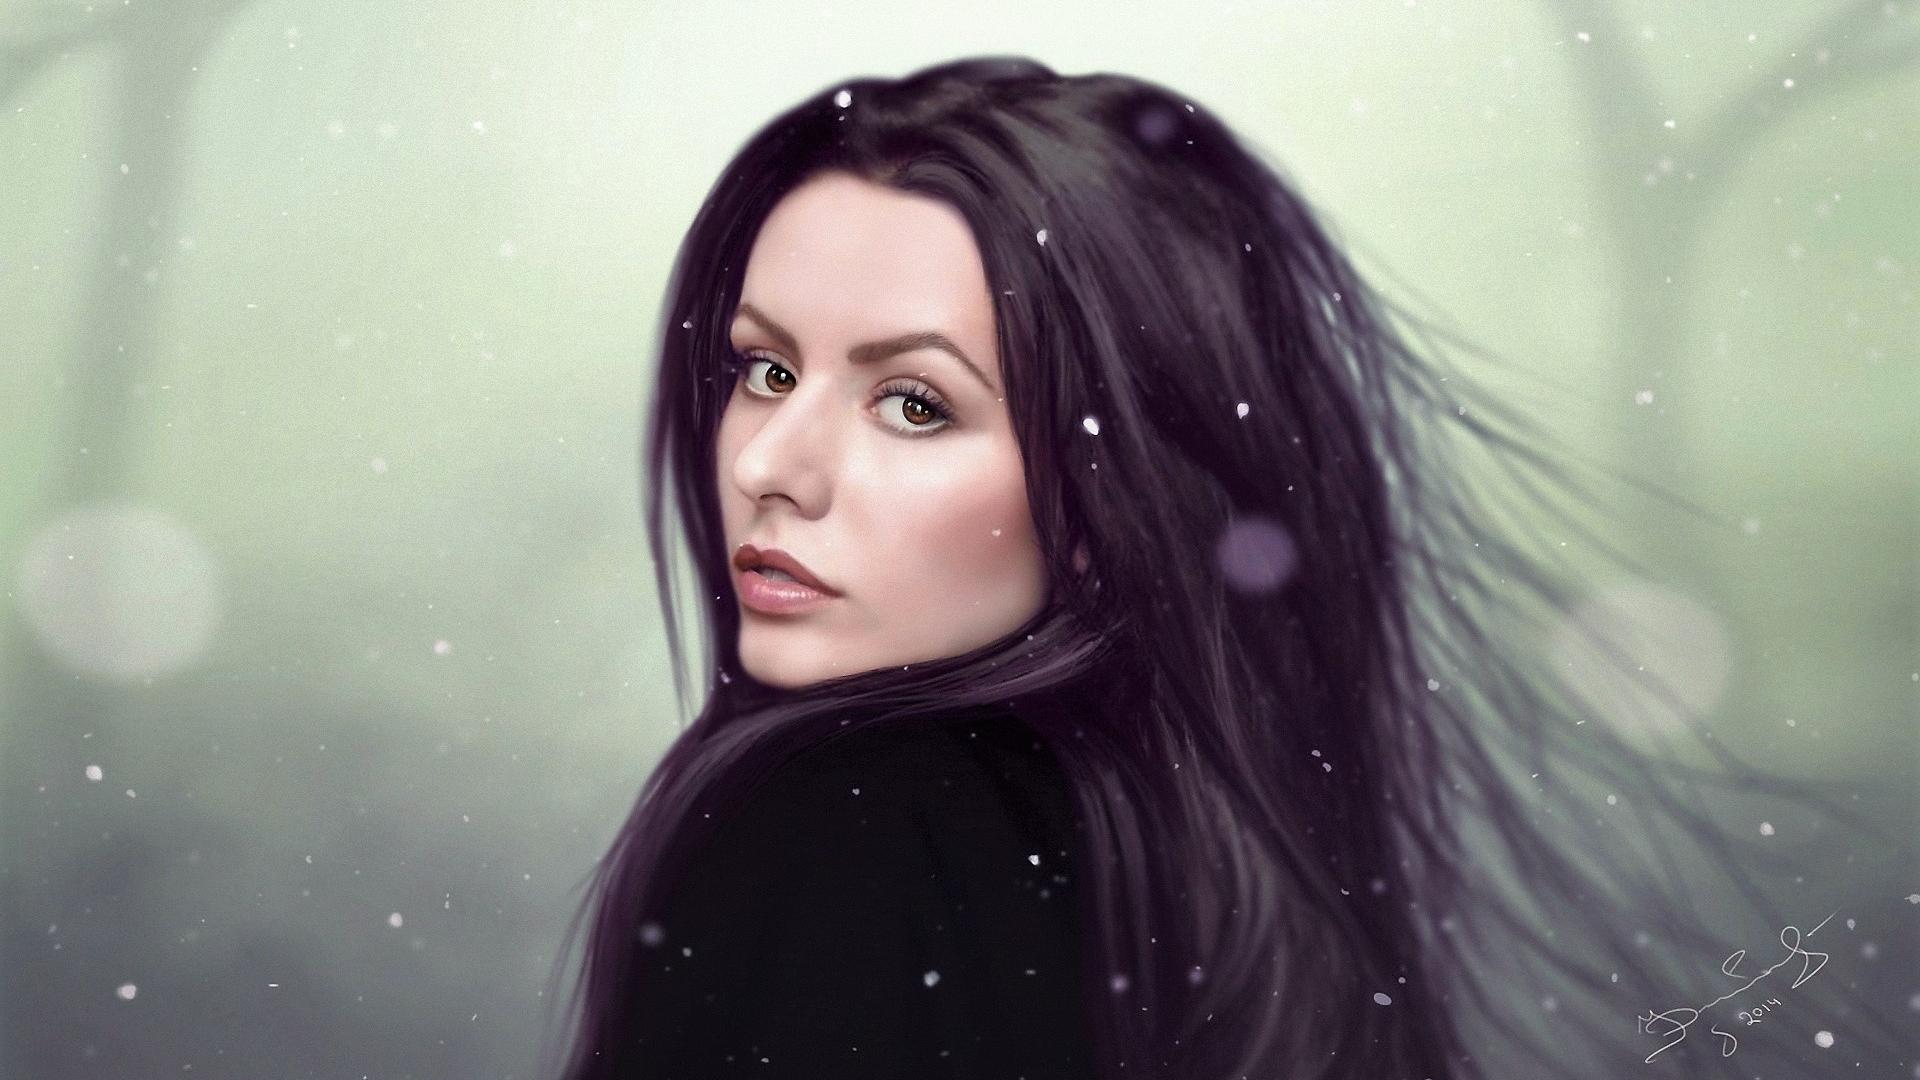 digital-art-women-long-hair-drawing-face-brown-eyes-8e.jpg